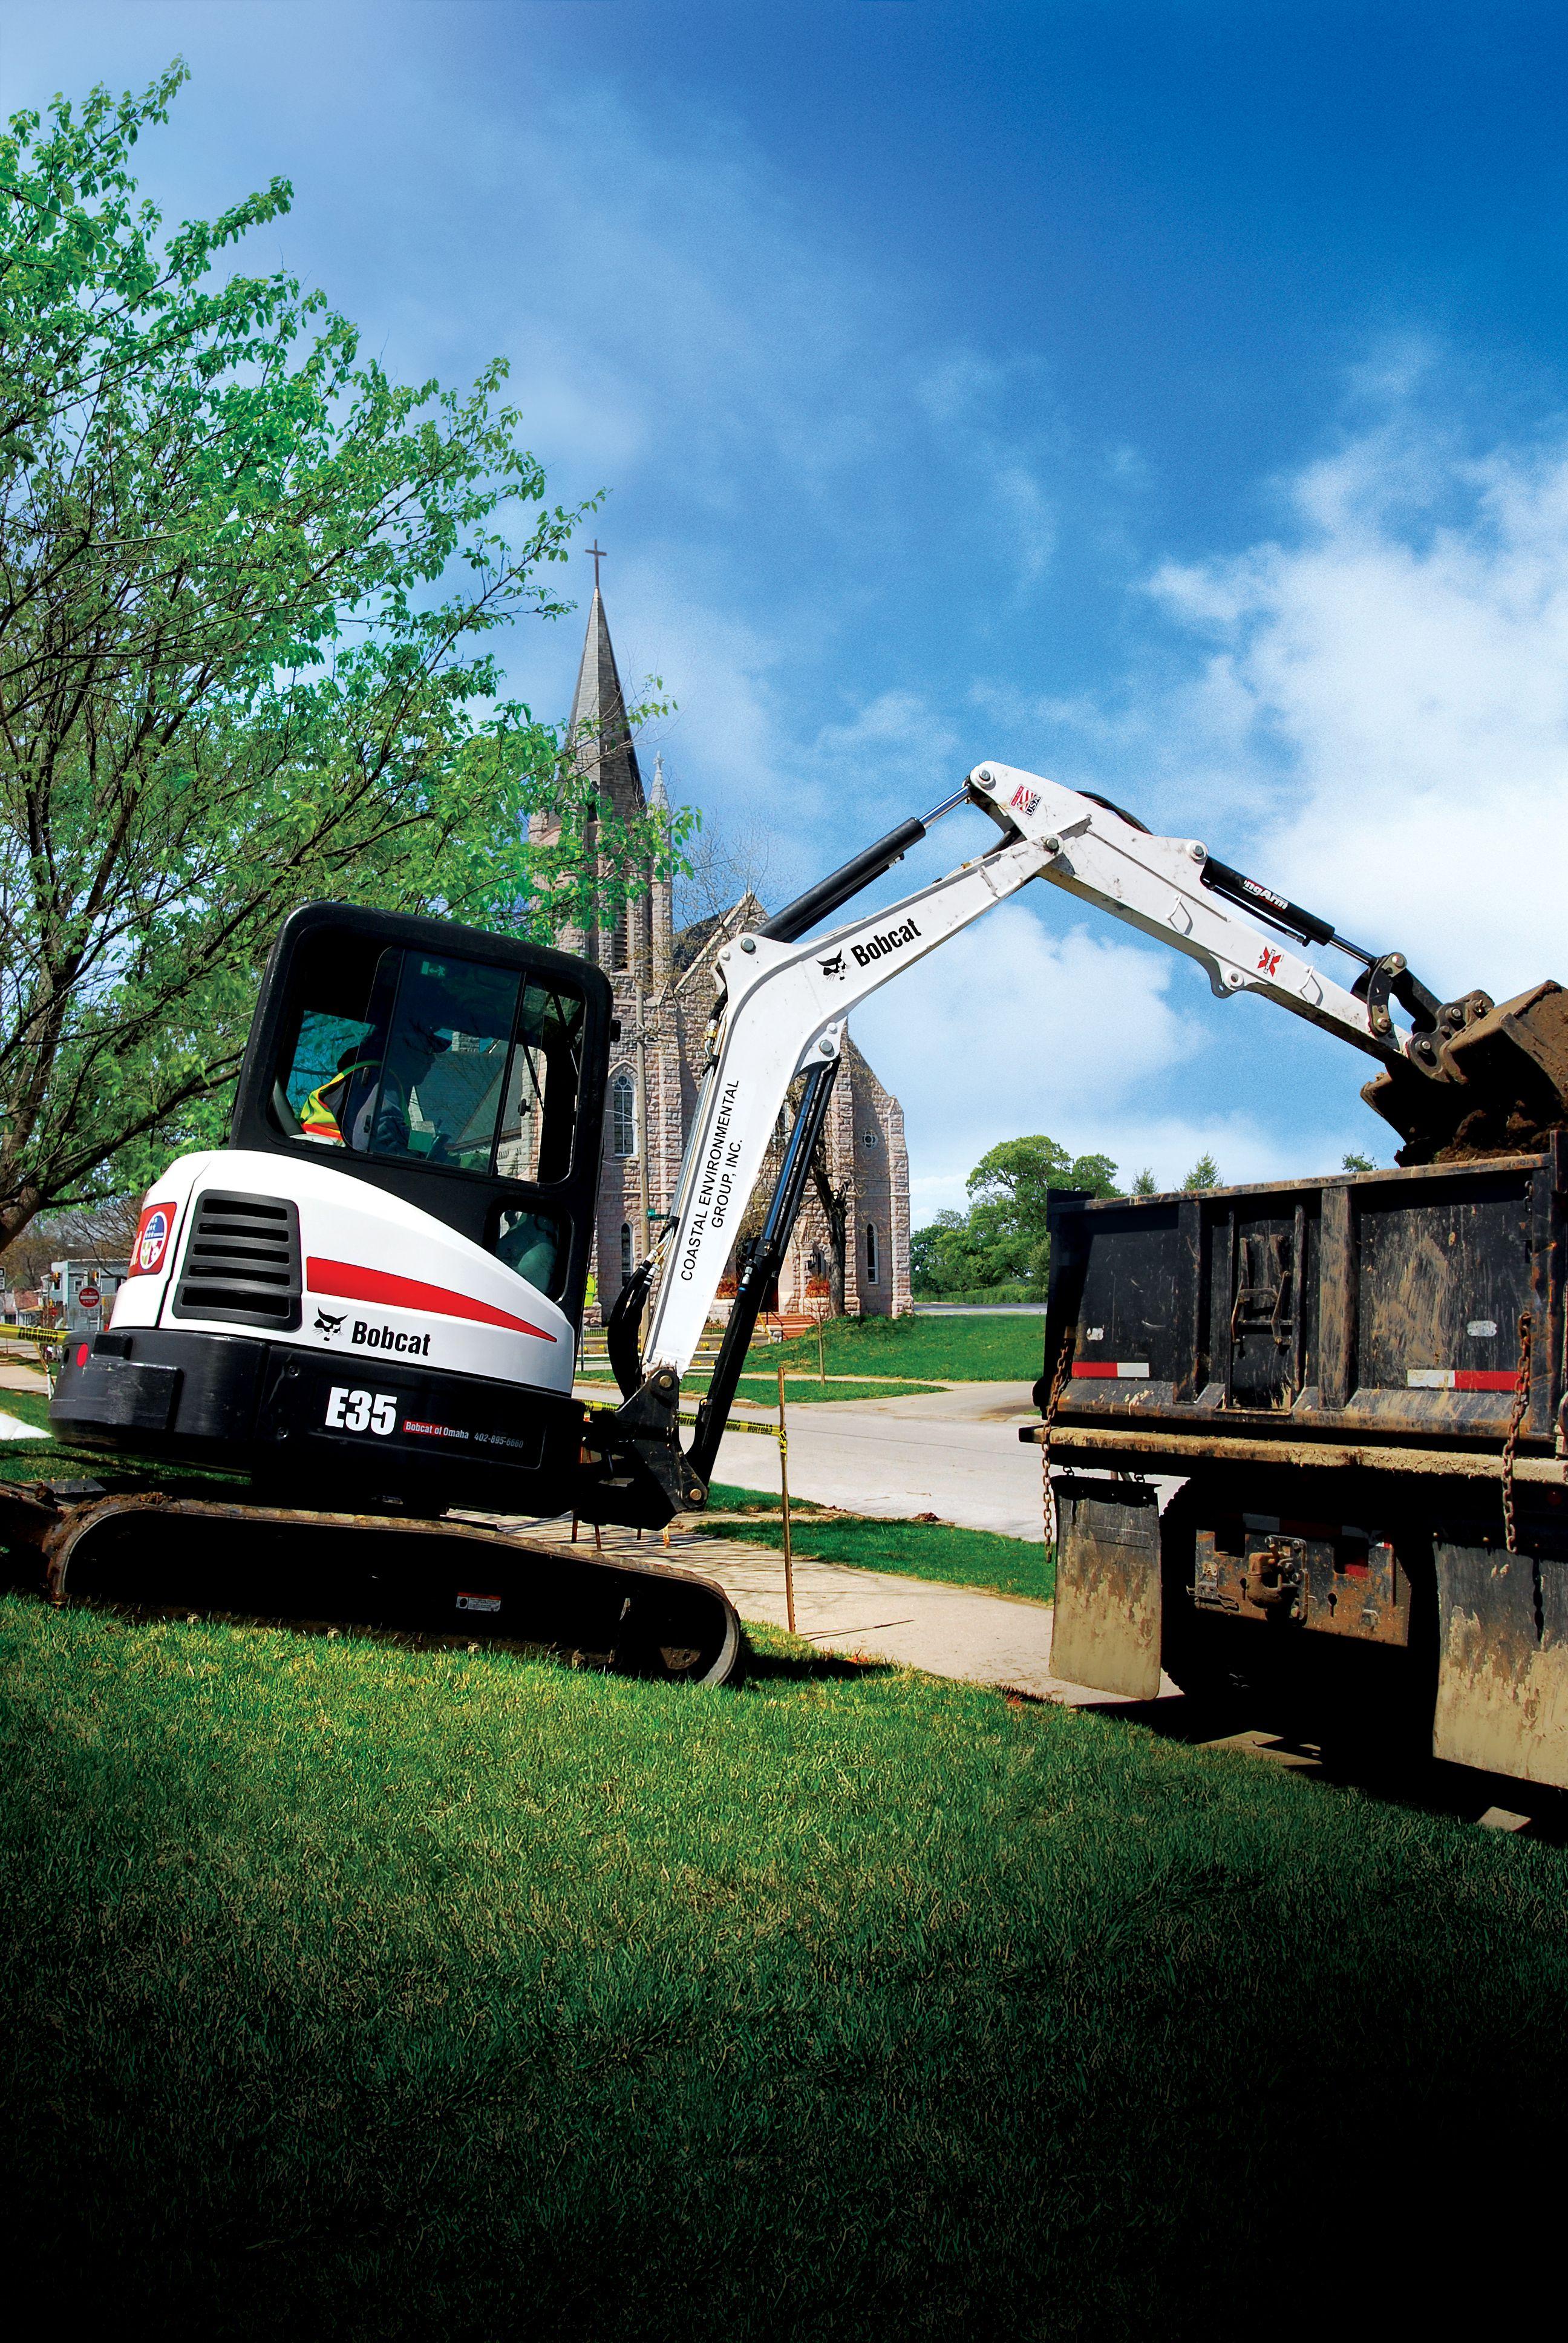 Bobcat E35 Compact Excavator Bobcat Company Excavator